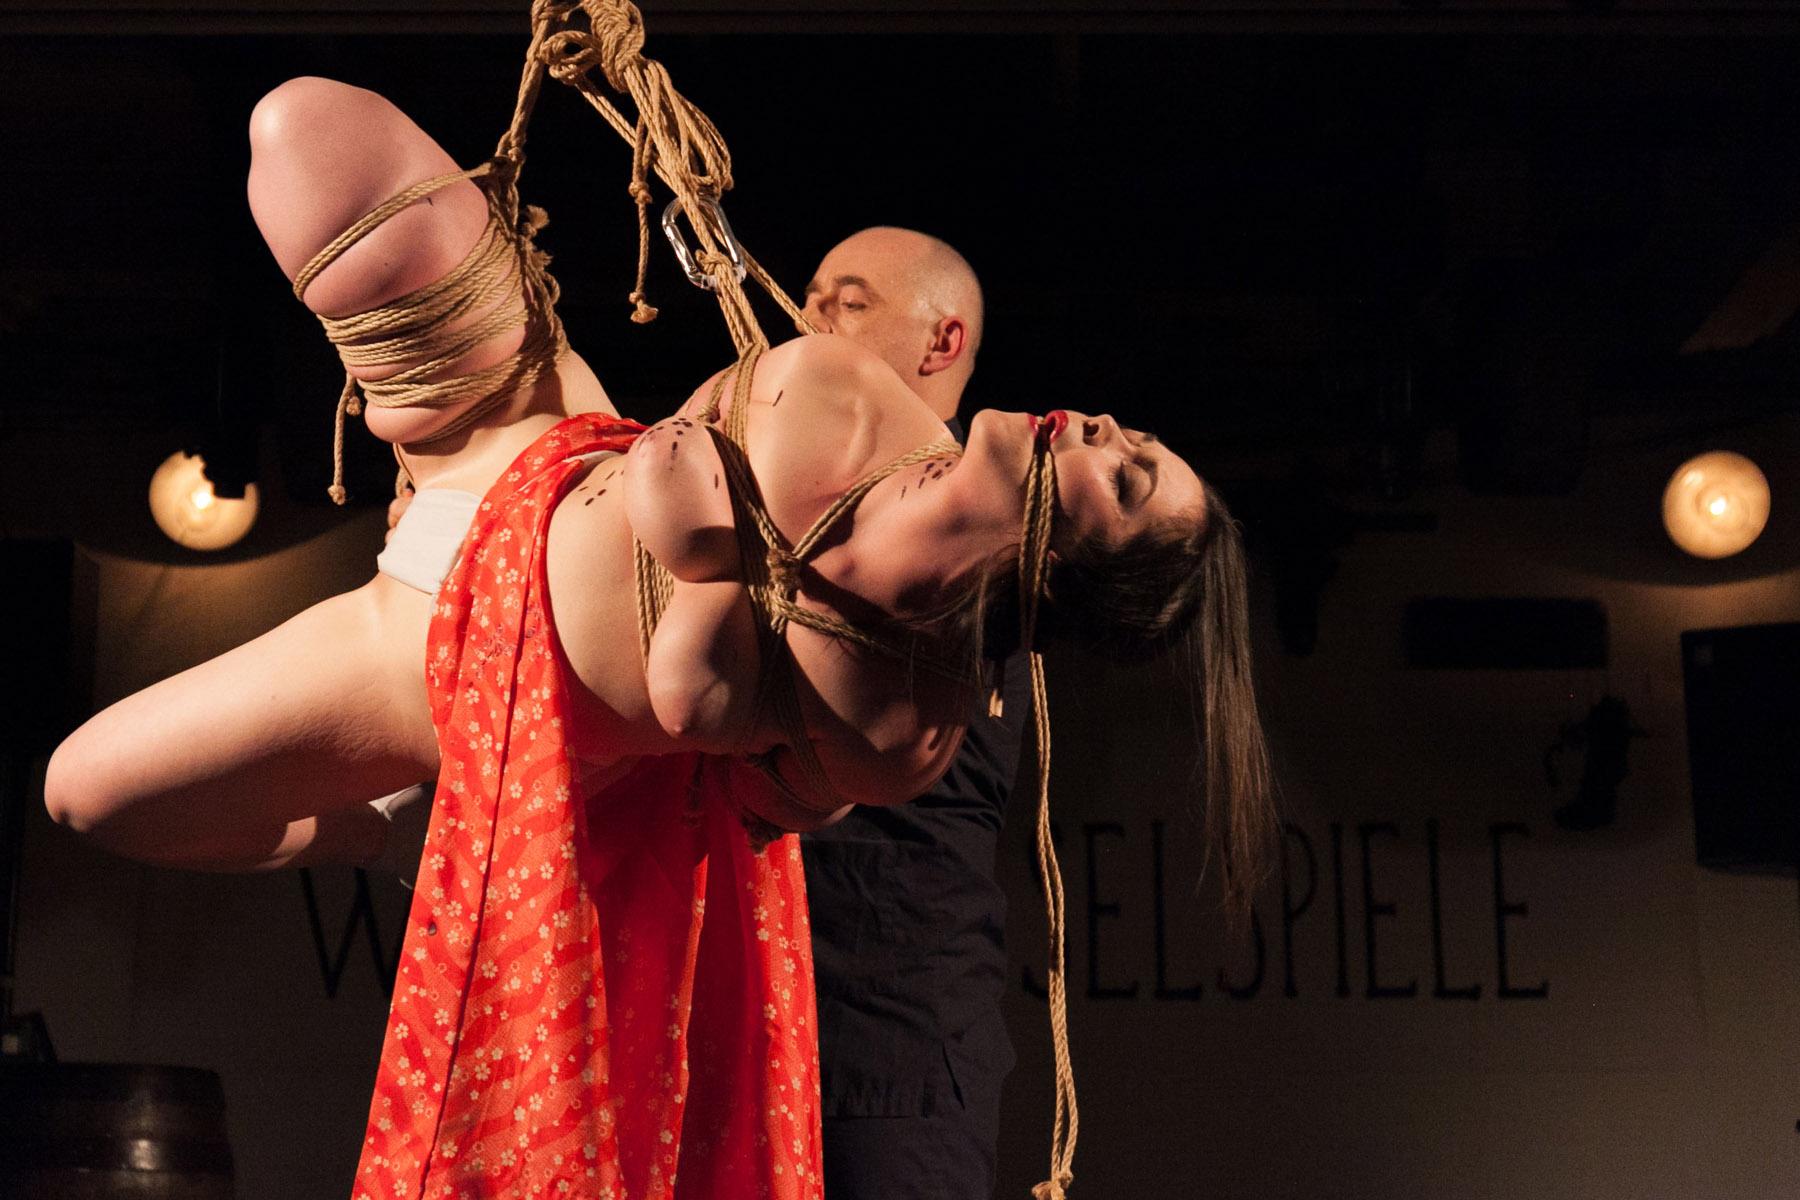 First Shibari Bondage Show In Vienna Austria In 2015